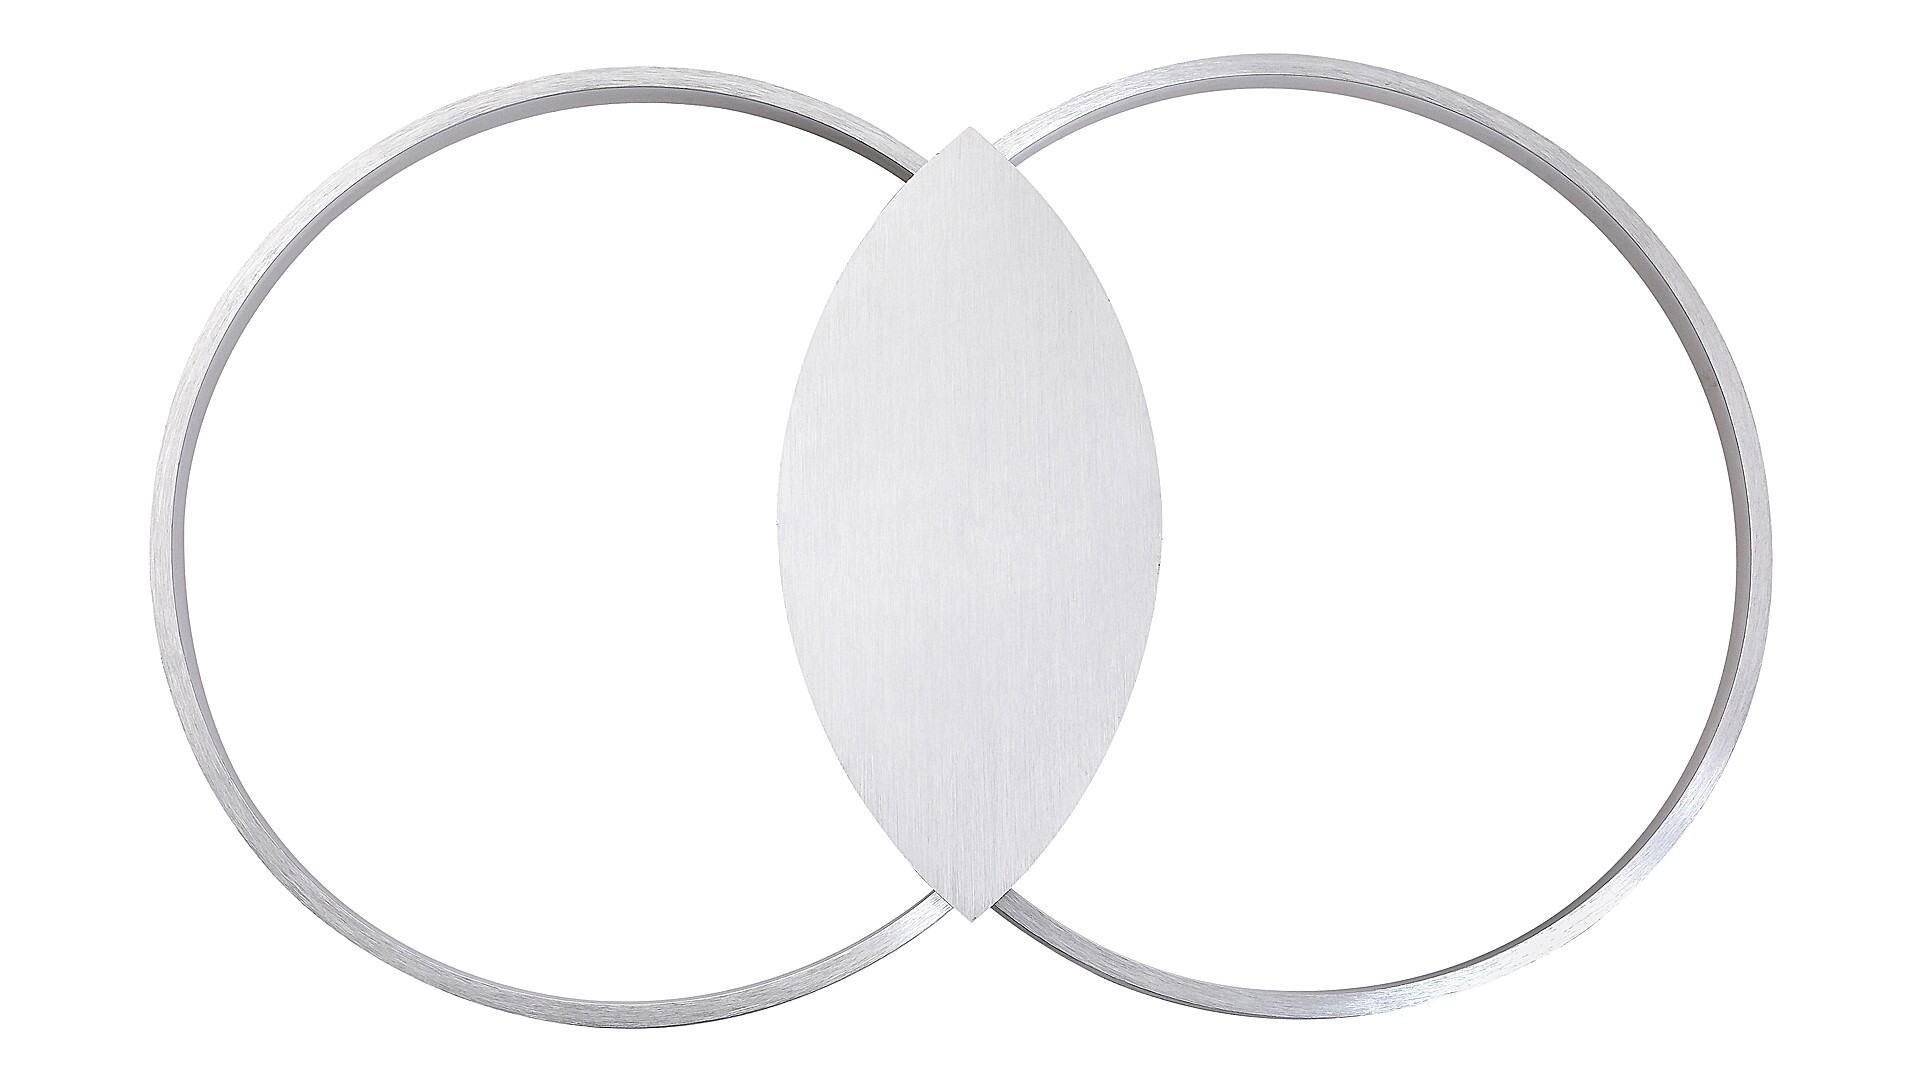 Lampa LED perete Rabalux, lumina indirecta, Aluminiu